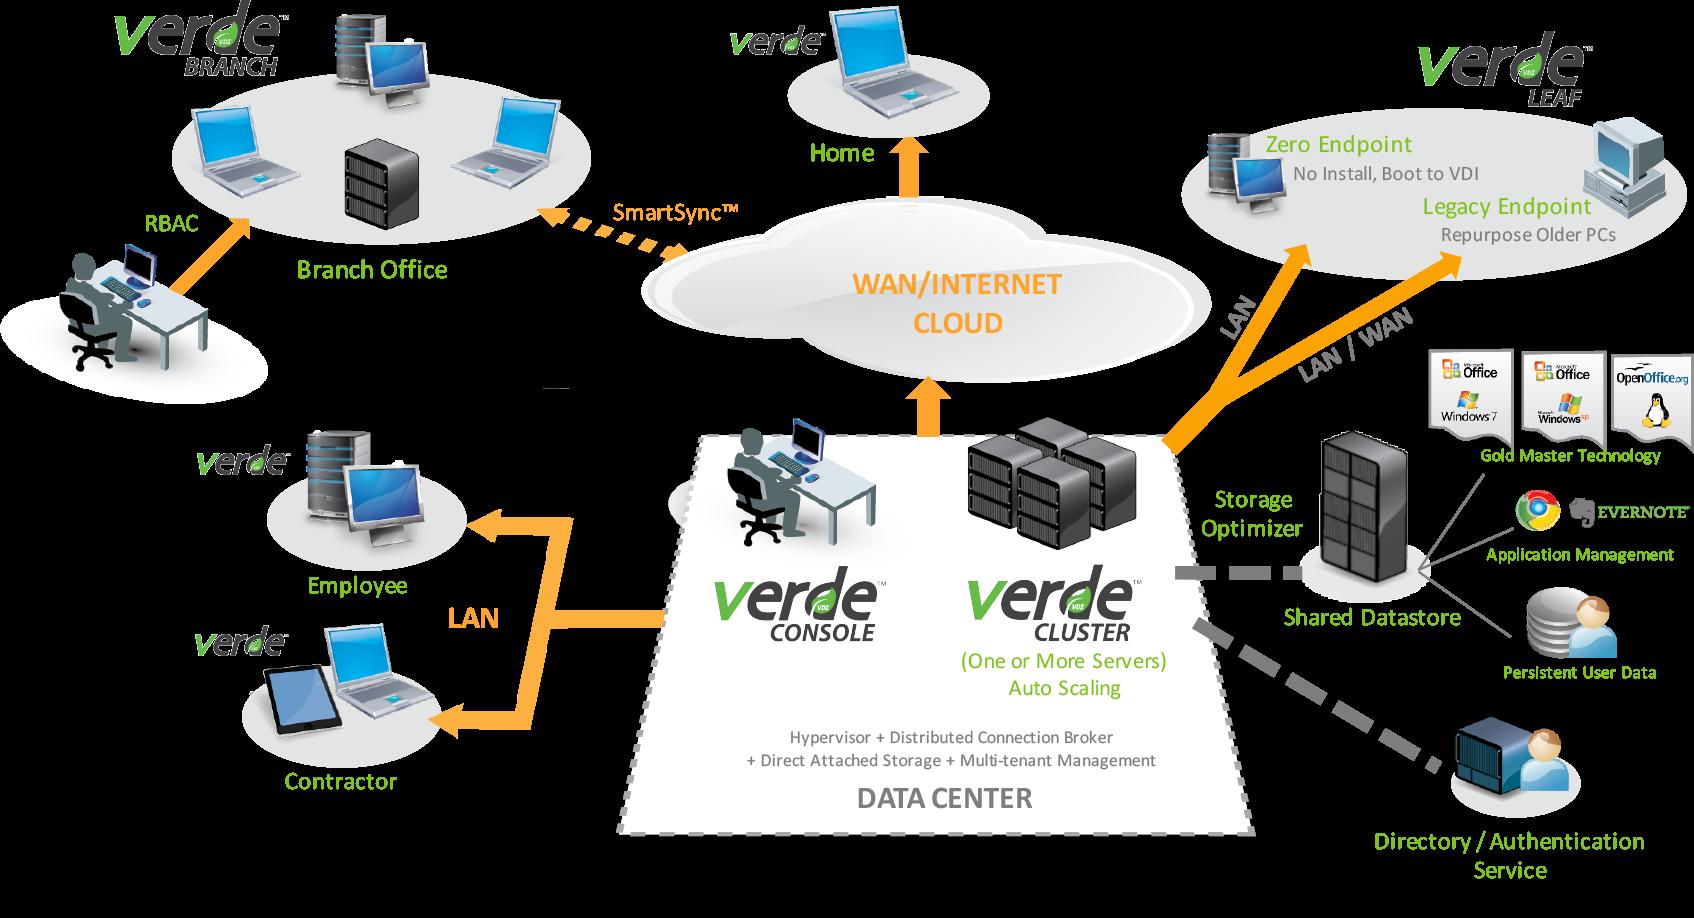 VERDE VDI虚拟桌面平台工作示意图